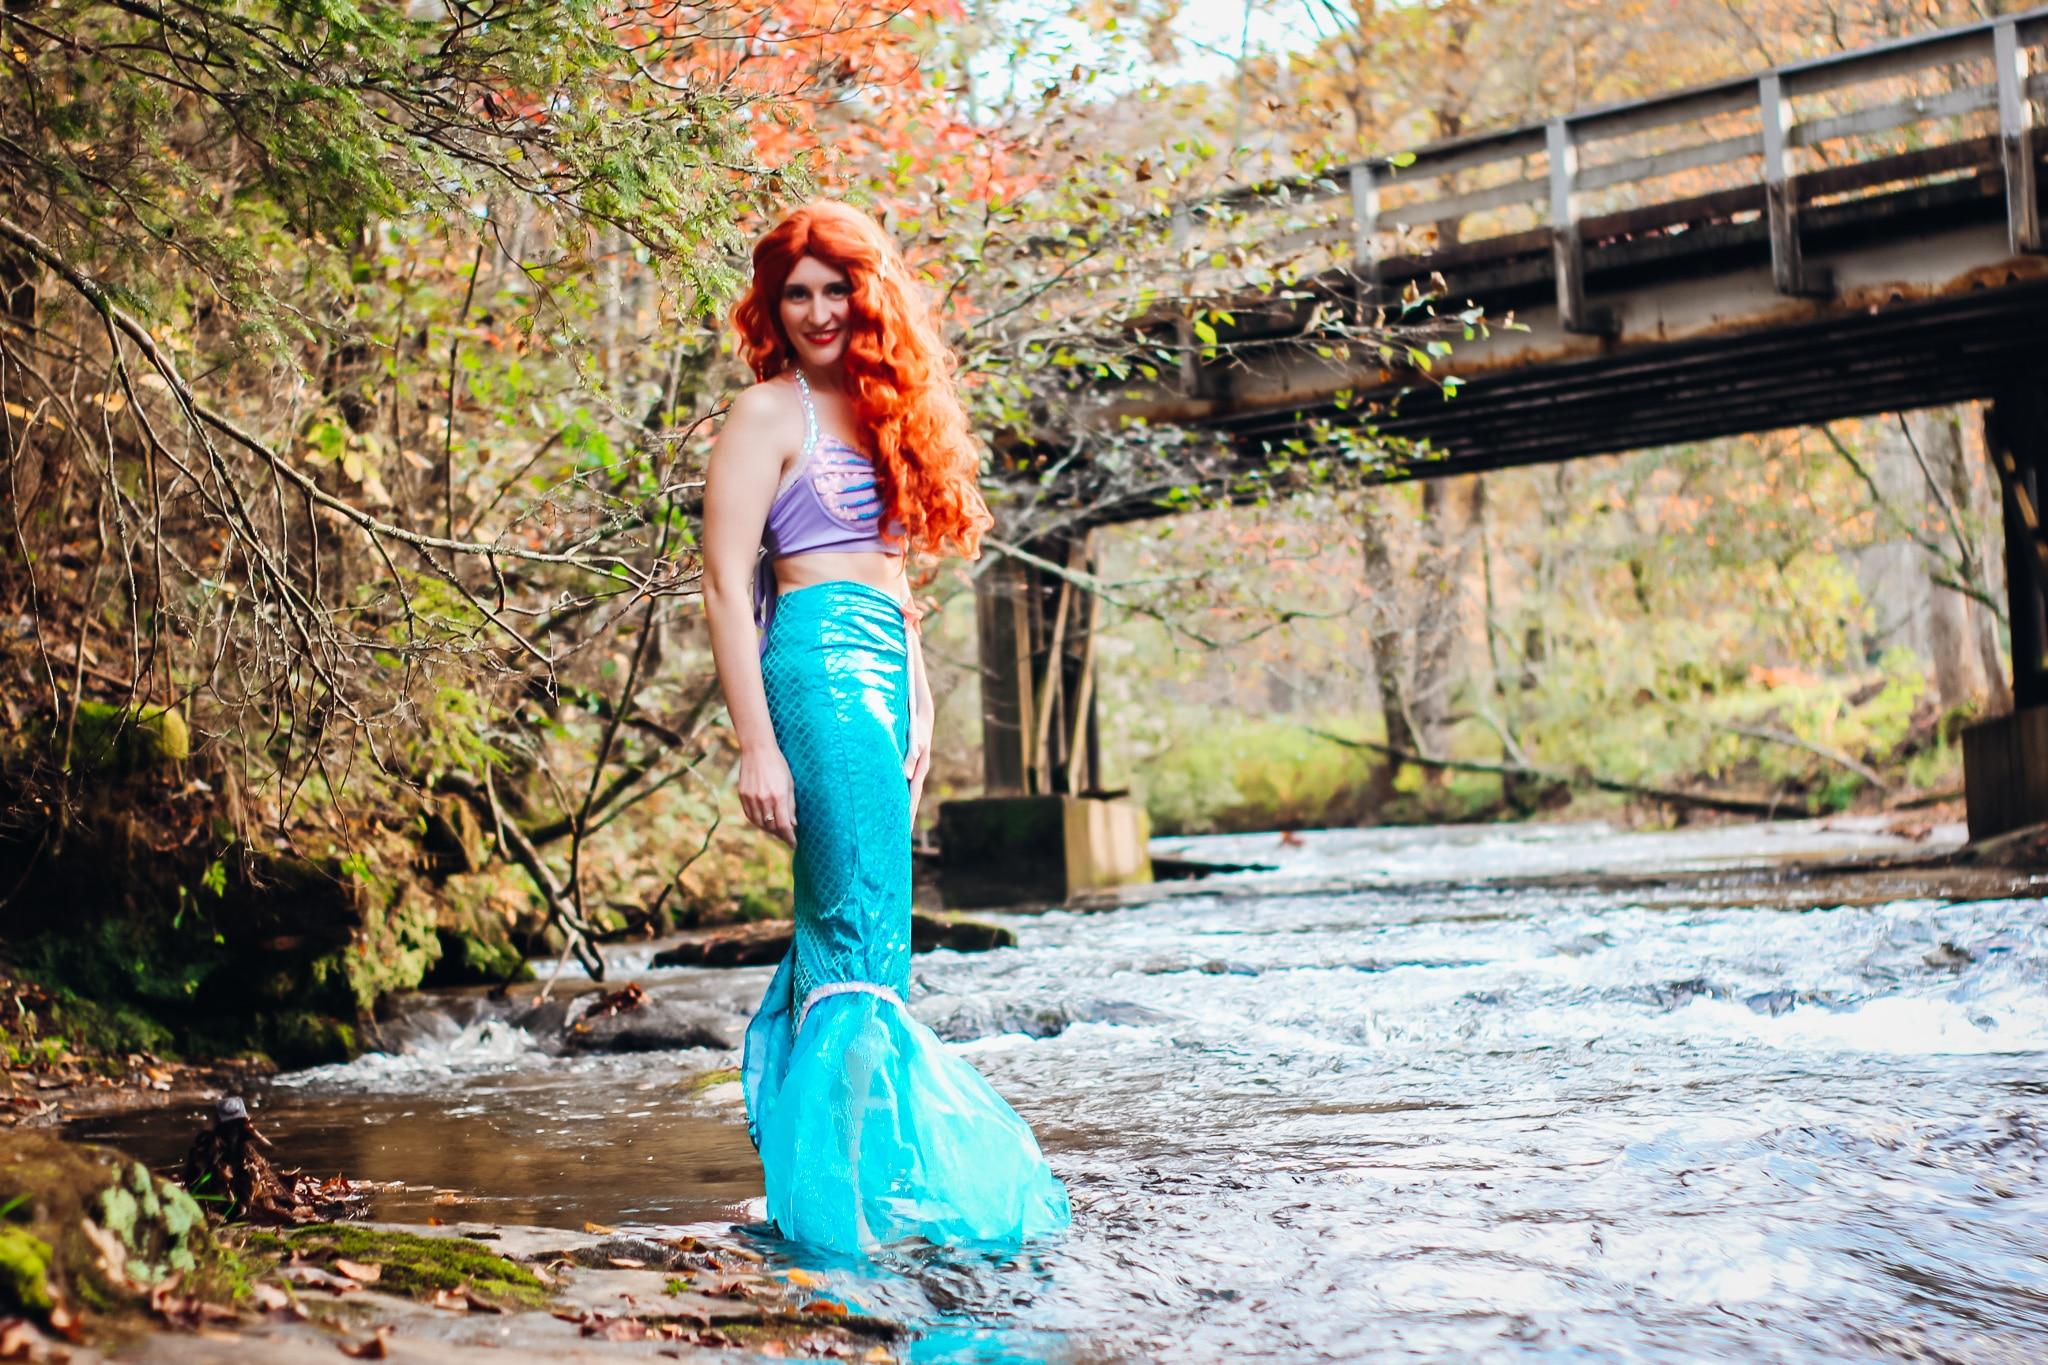 Little Mermaid Halloween Costume, Standing